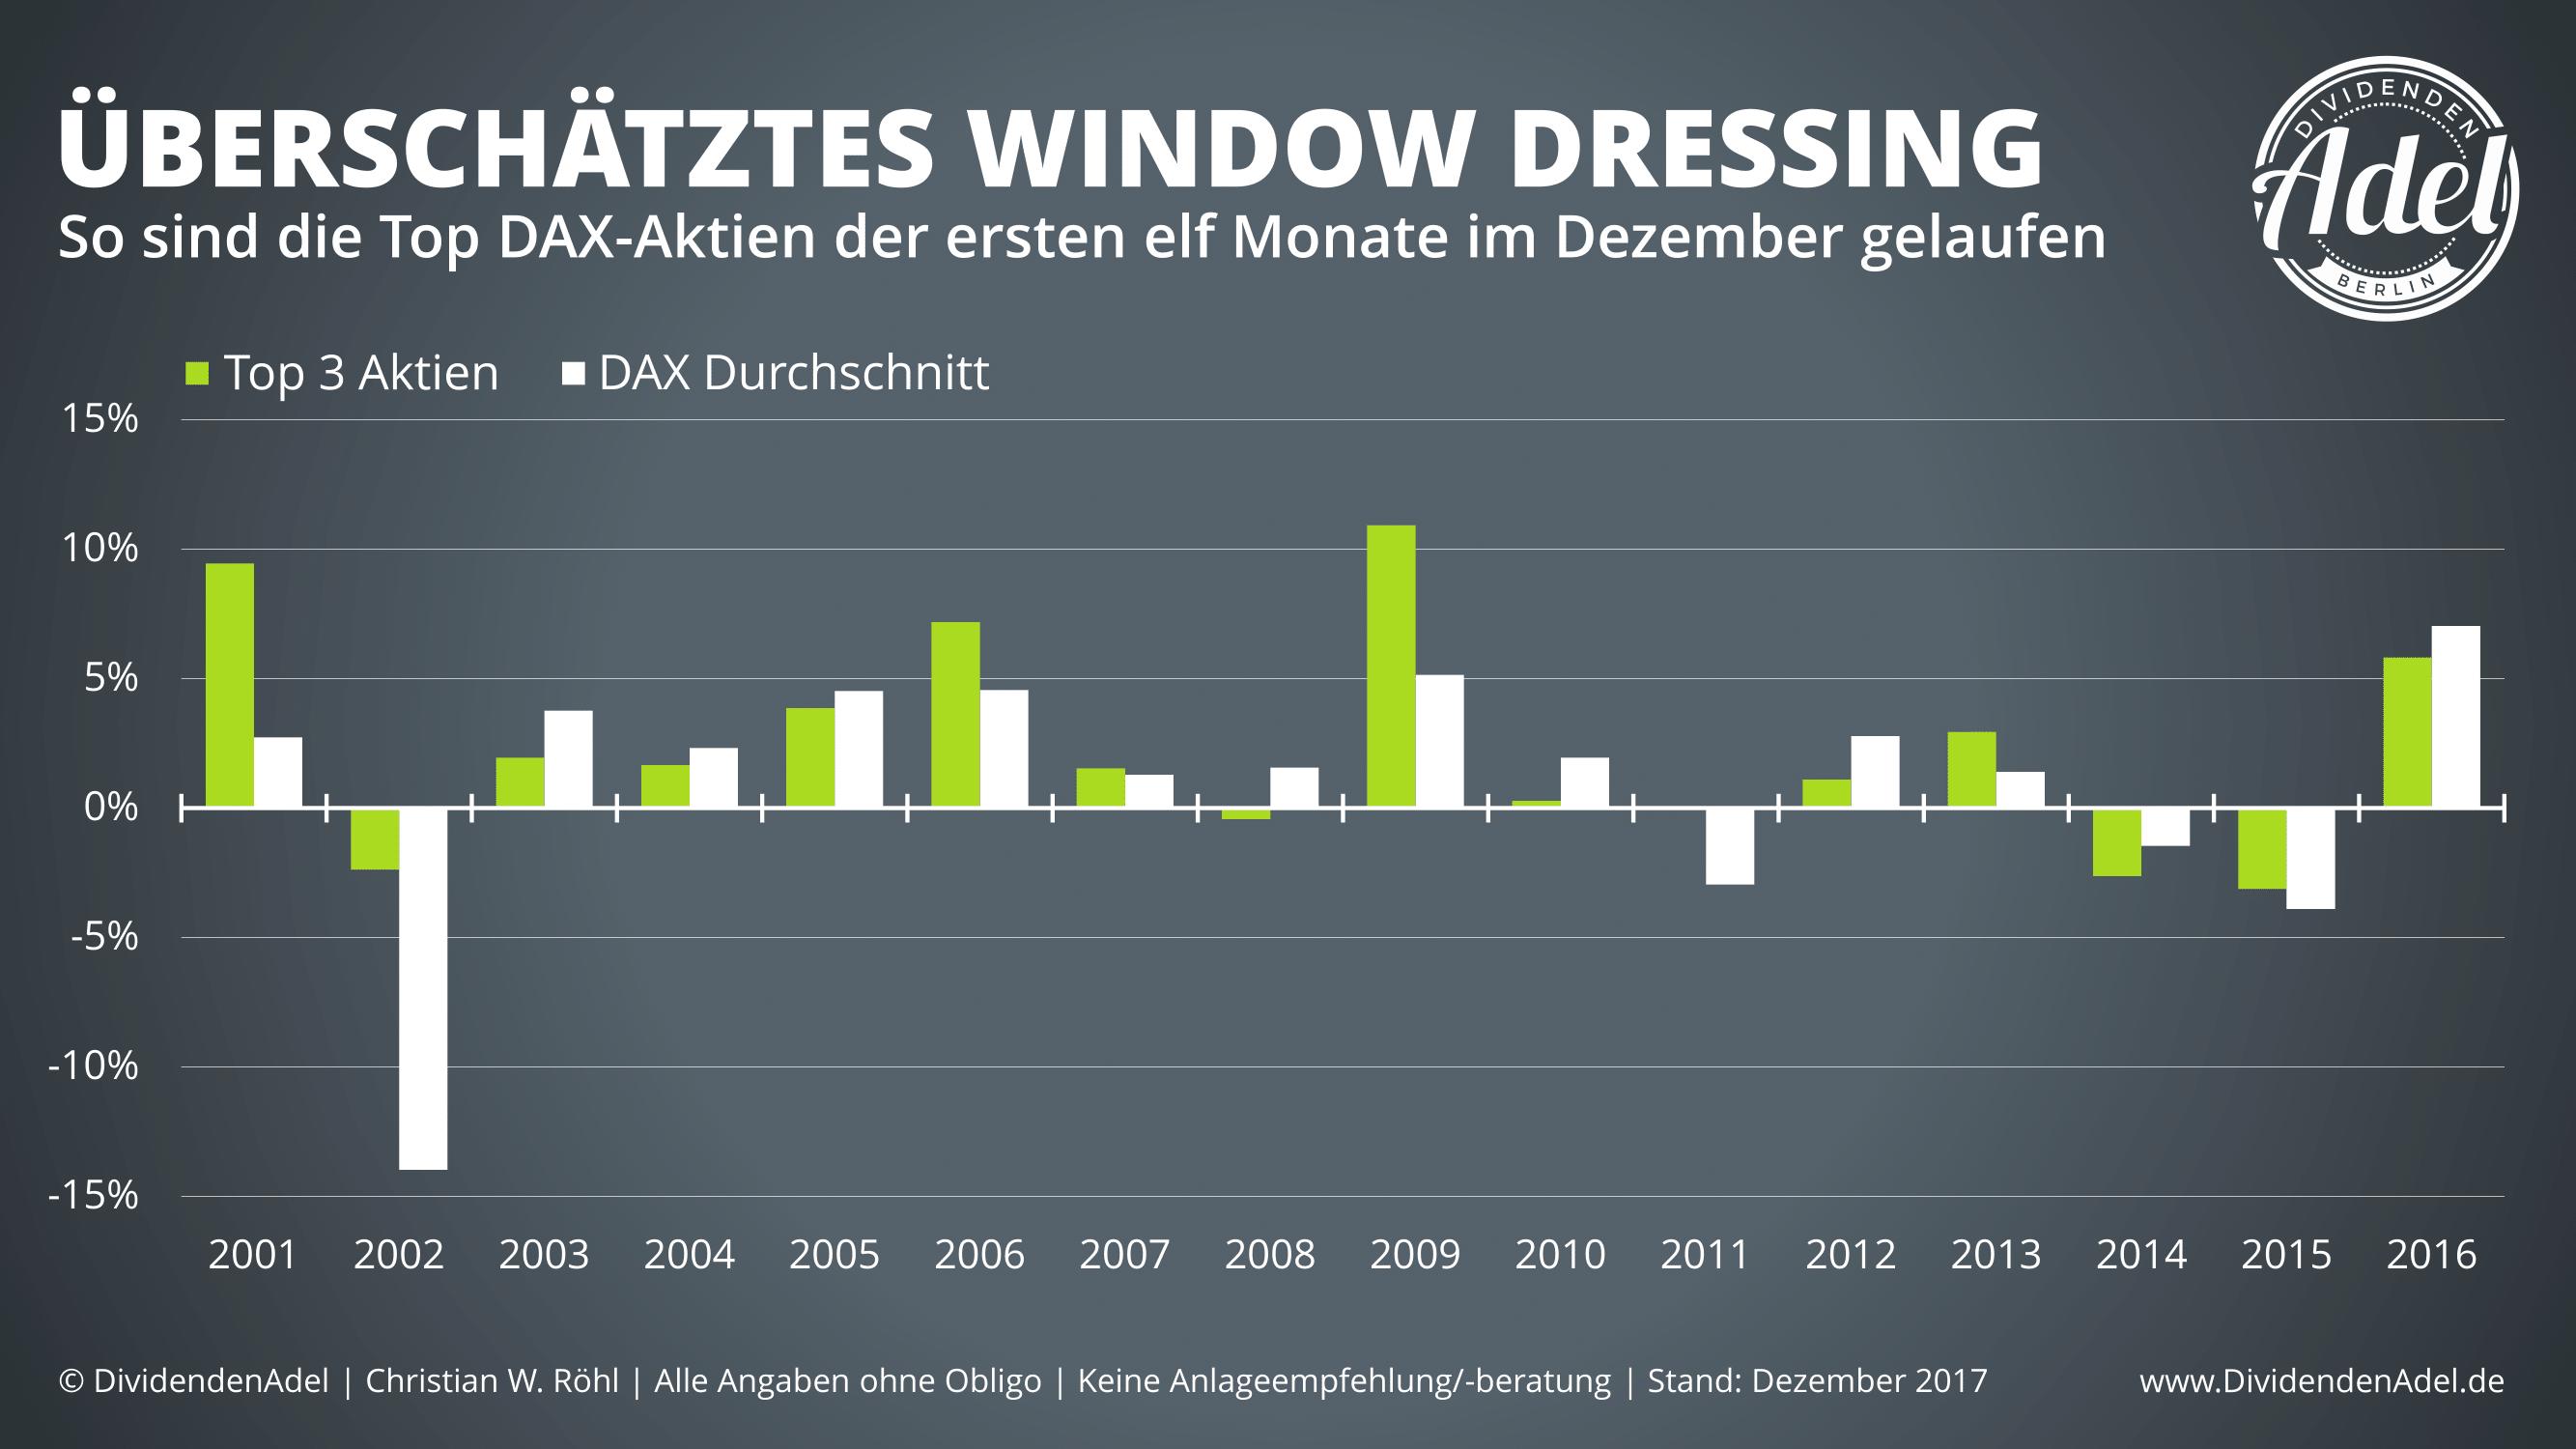 Window Dressing DAX Top 3